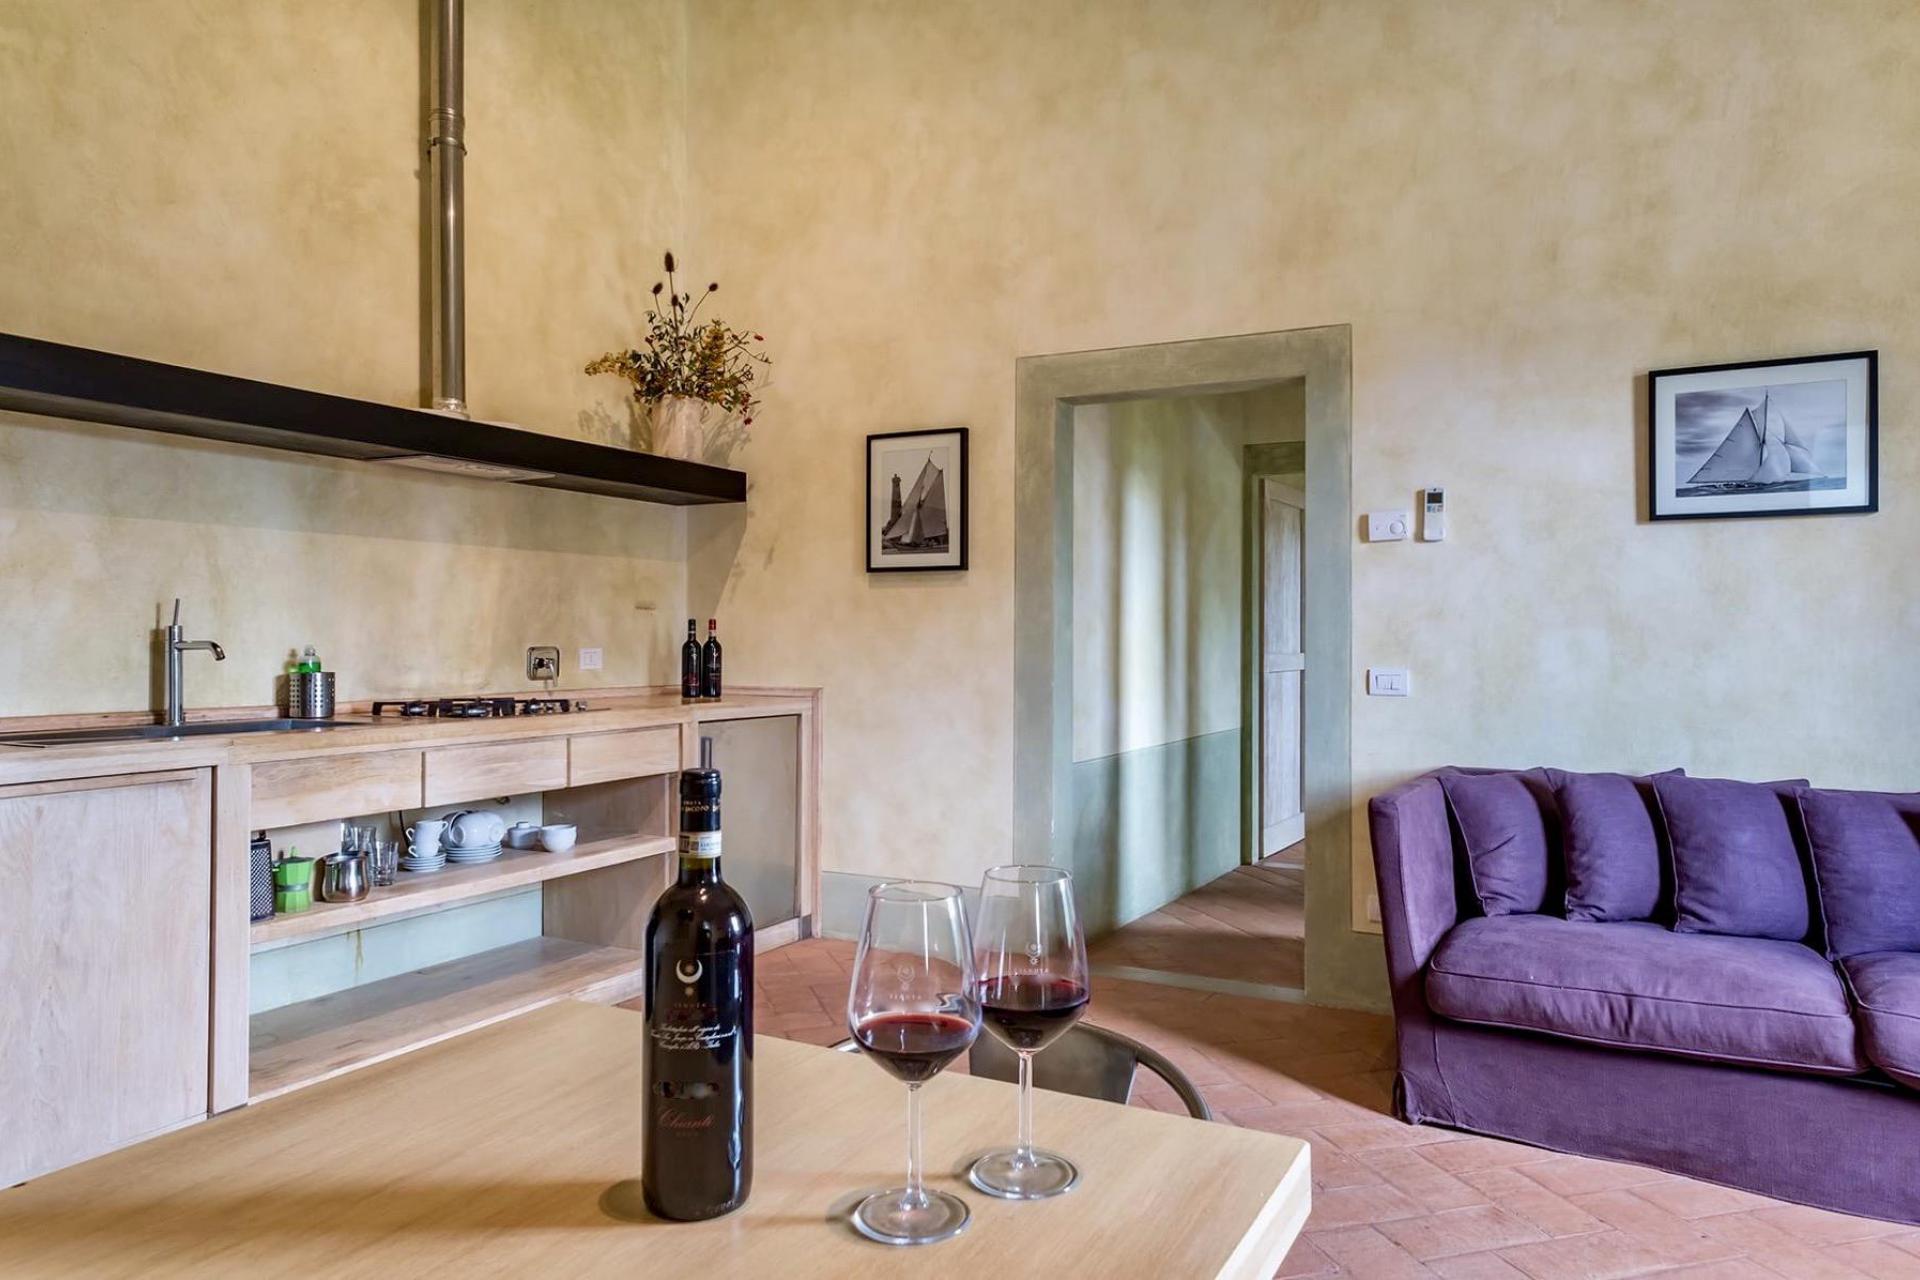 Agriturismo Toscane Agriturismo wijnboerderij Toscane - Chianti-streek | myitaly.nl